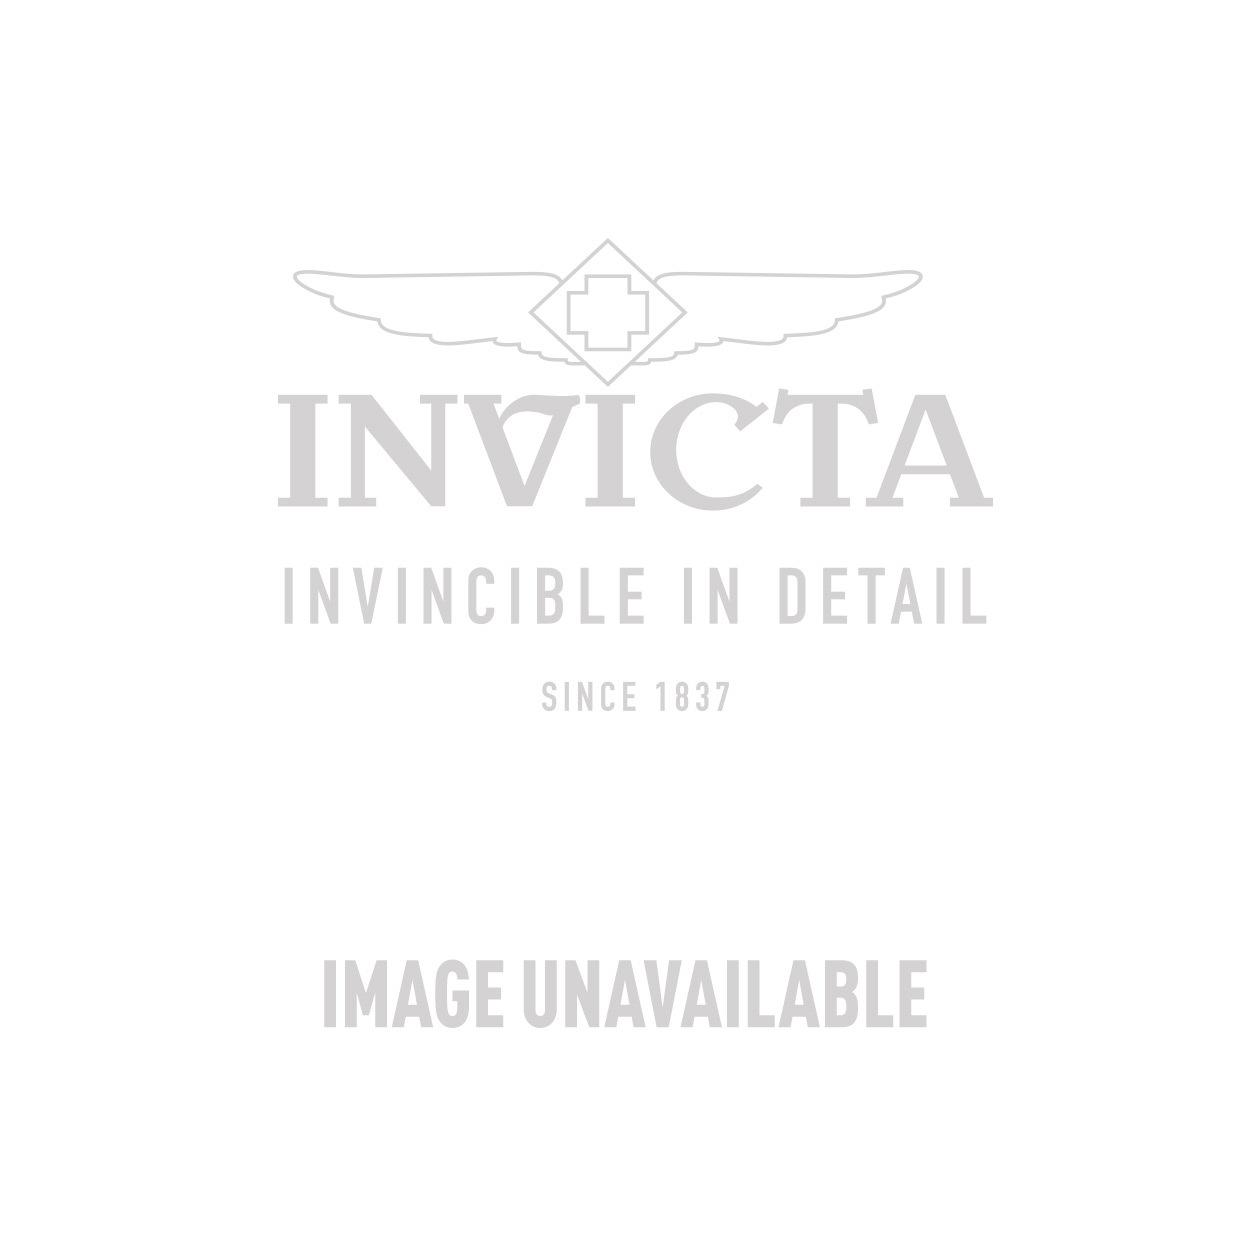 Invicta Sea Hunter Swiss Made Quartz Watch - Black case with Black tone Polyurethane band - Model 0414